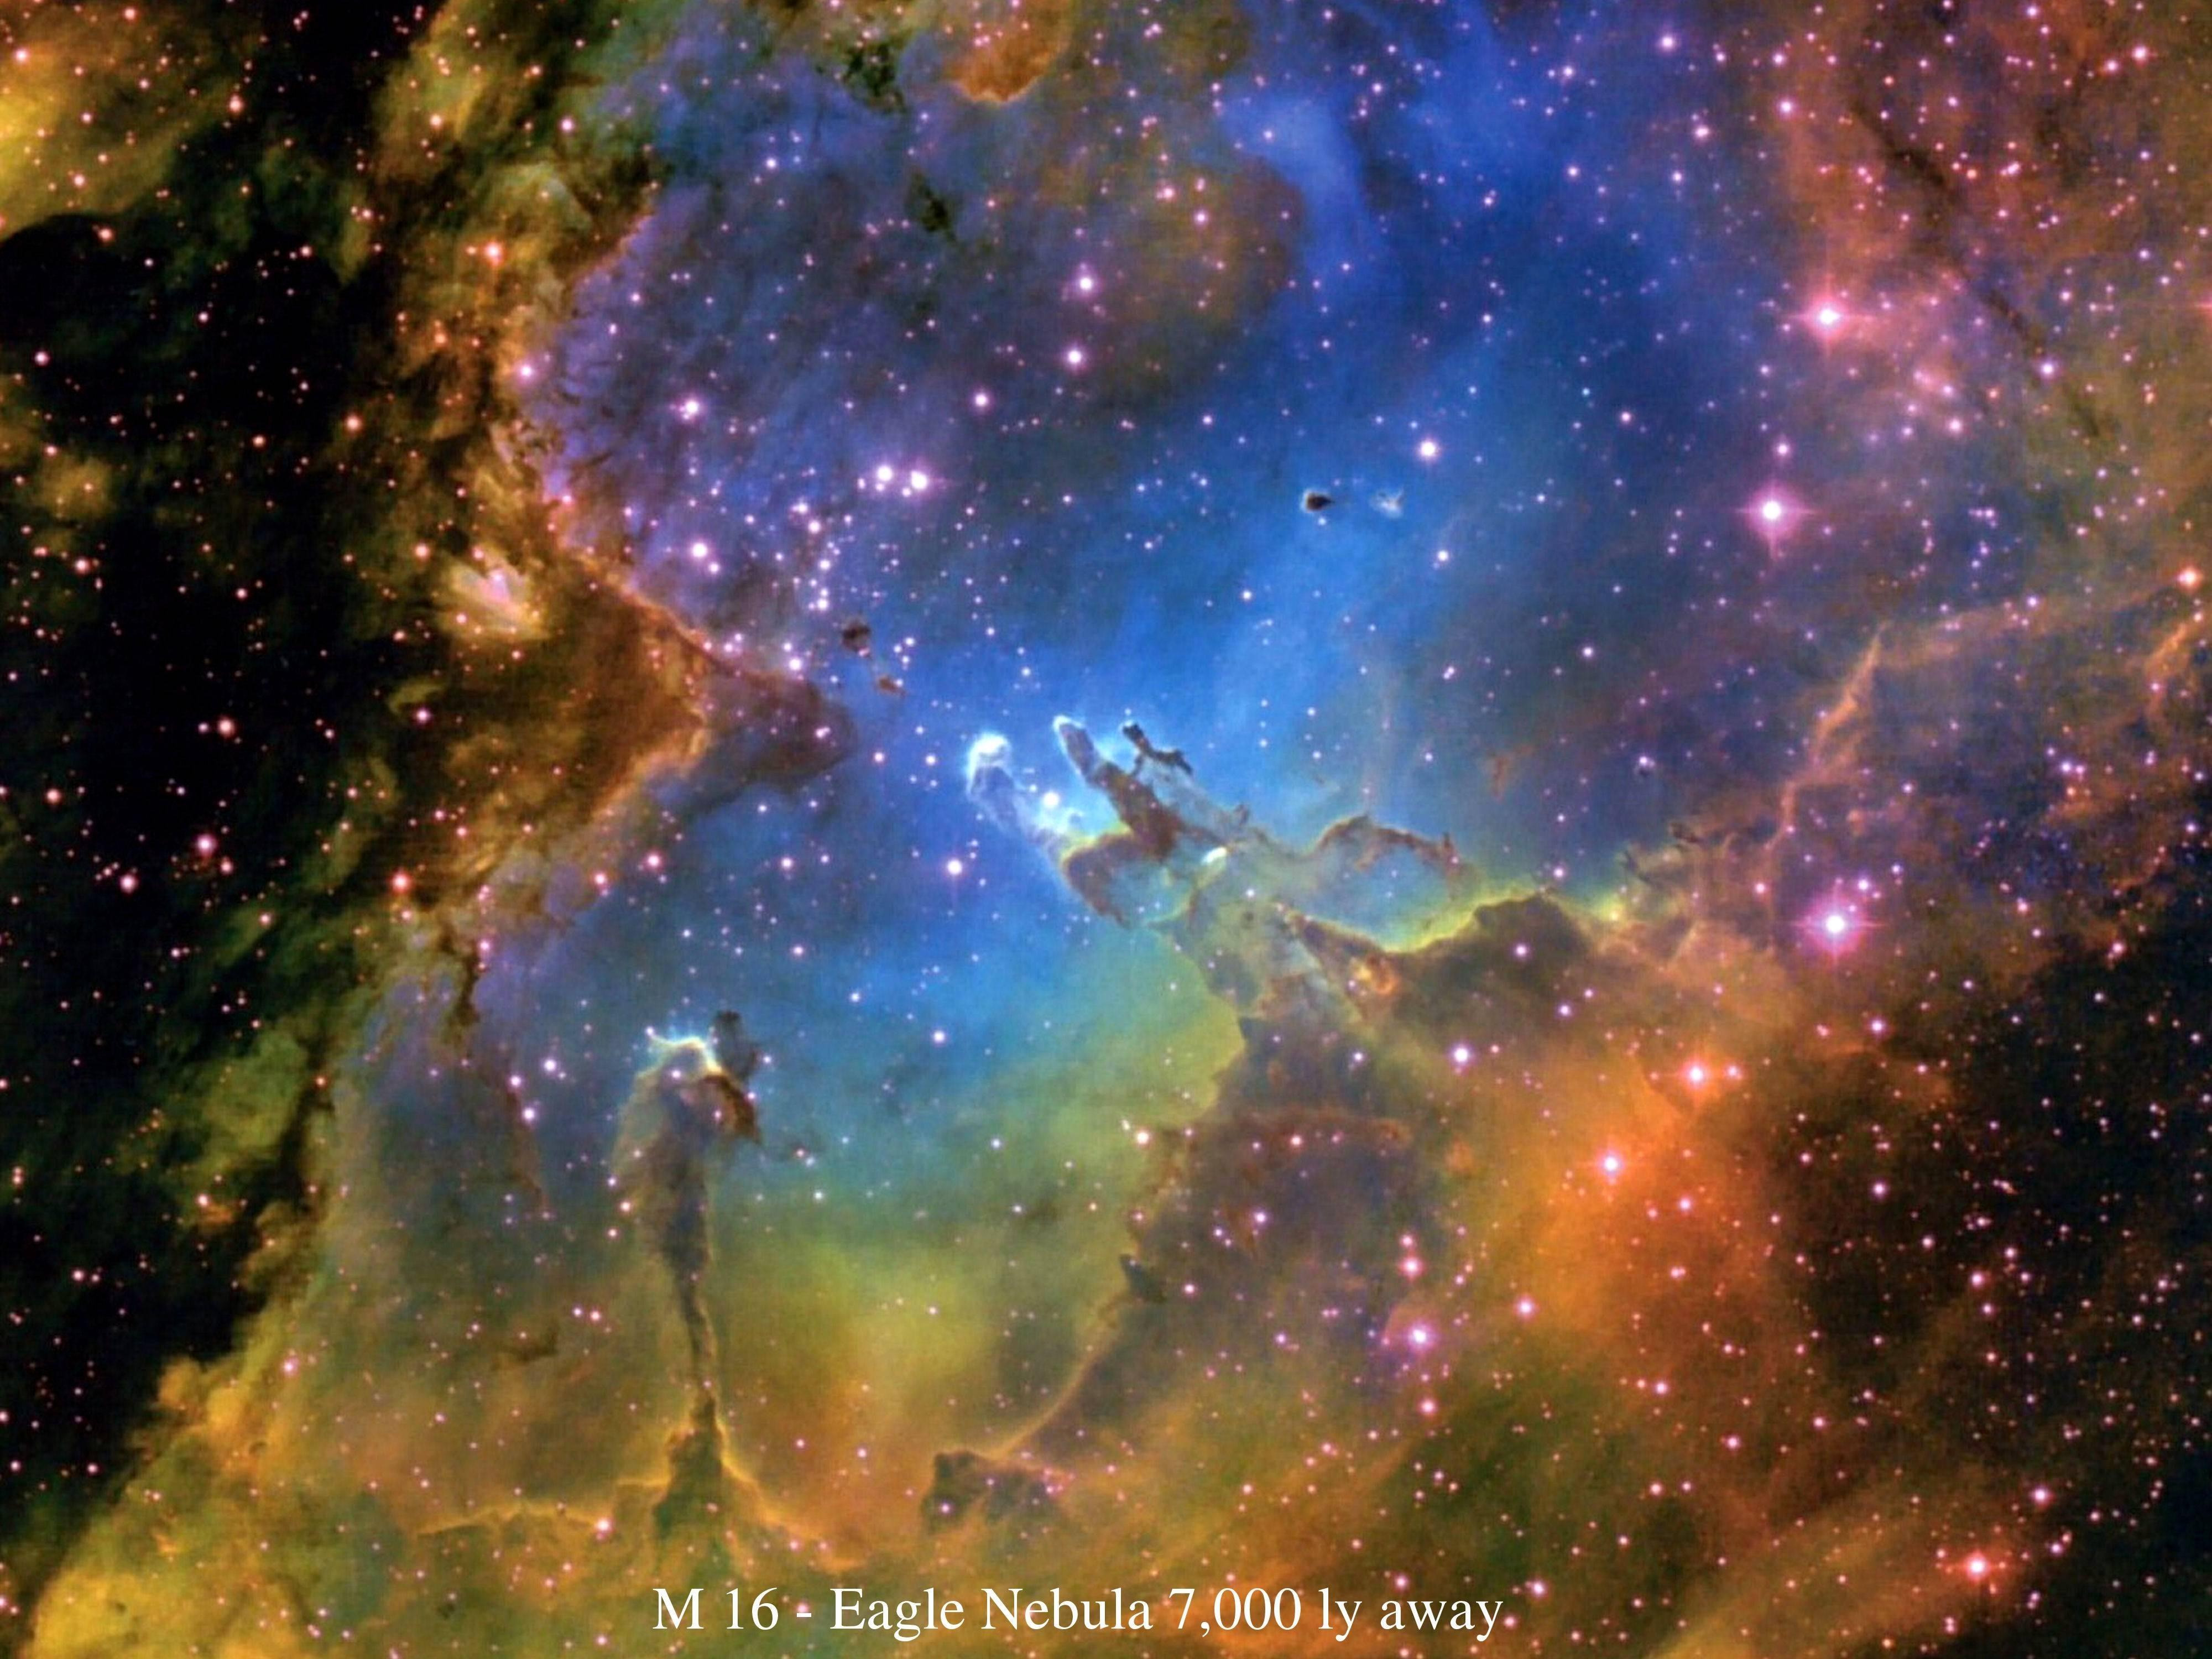 eagle nebula wallpapers - wallpaper cave